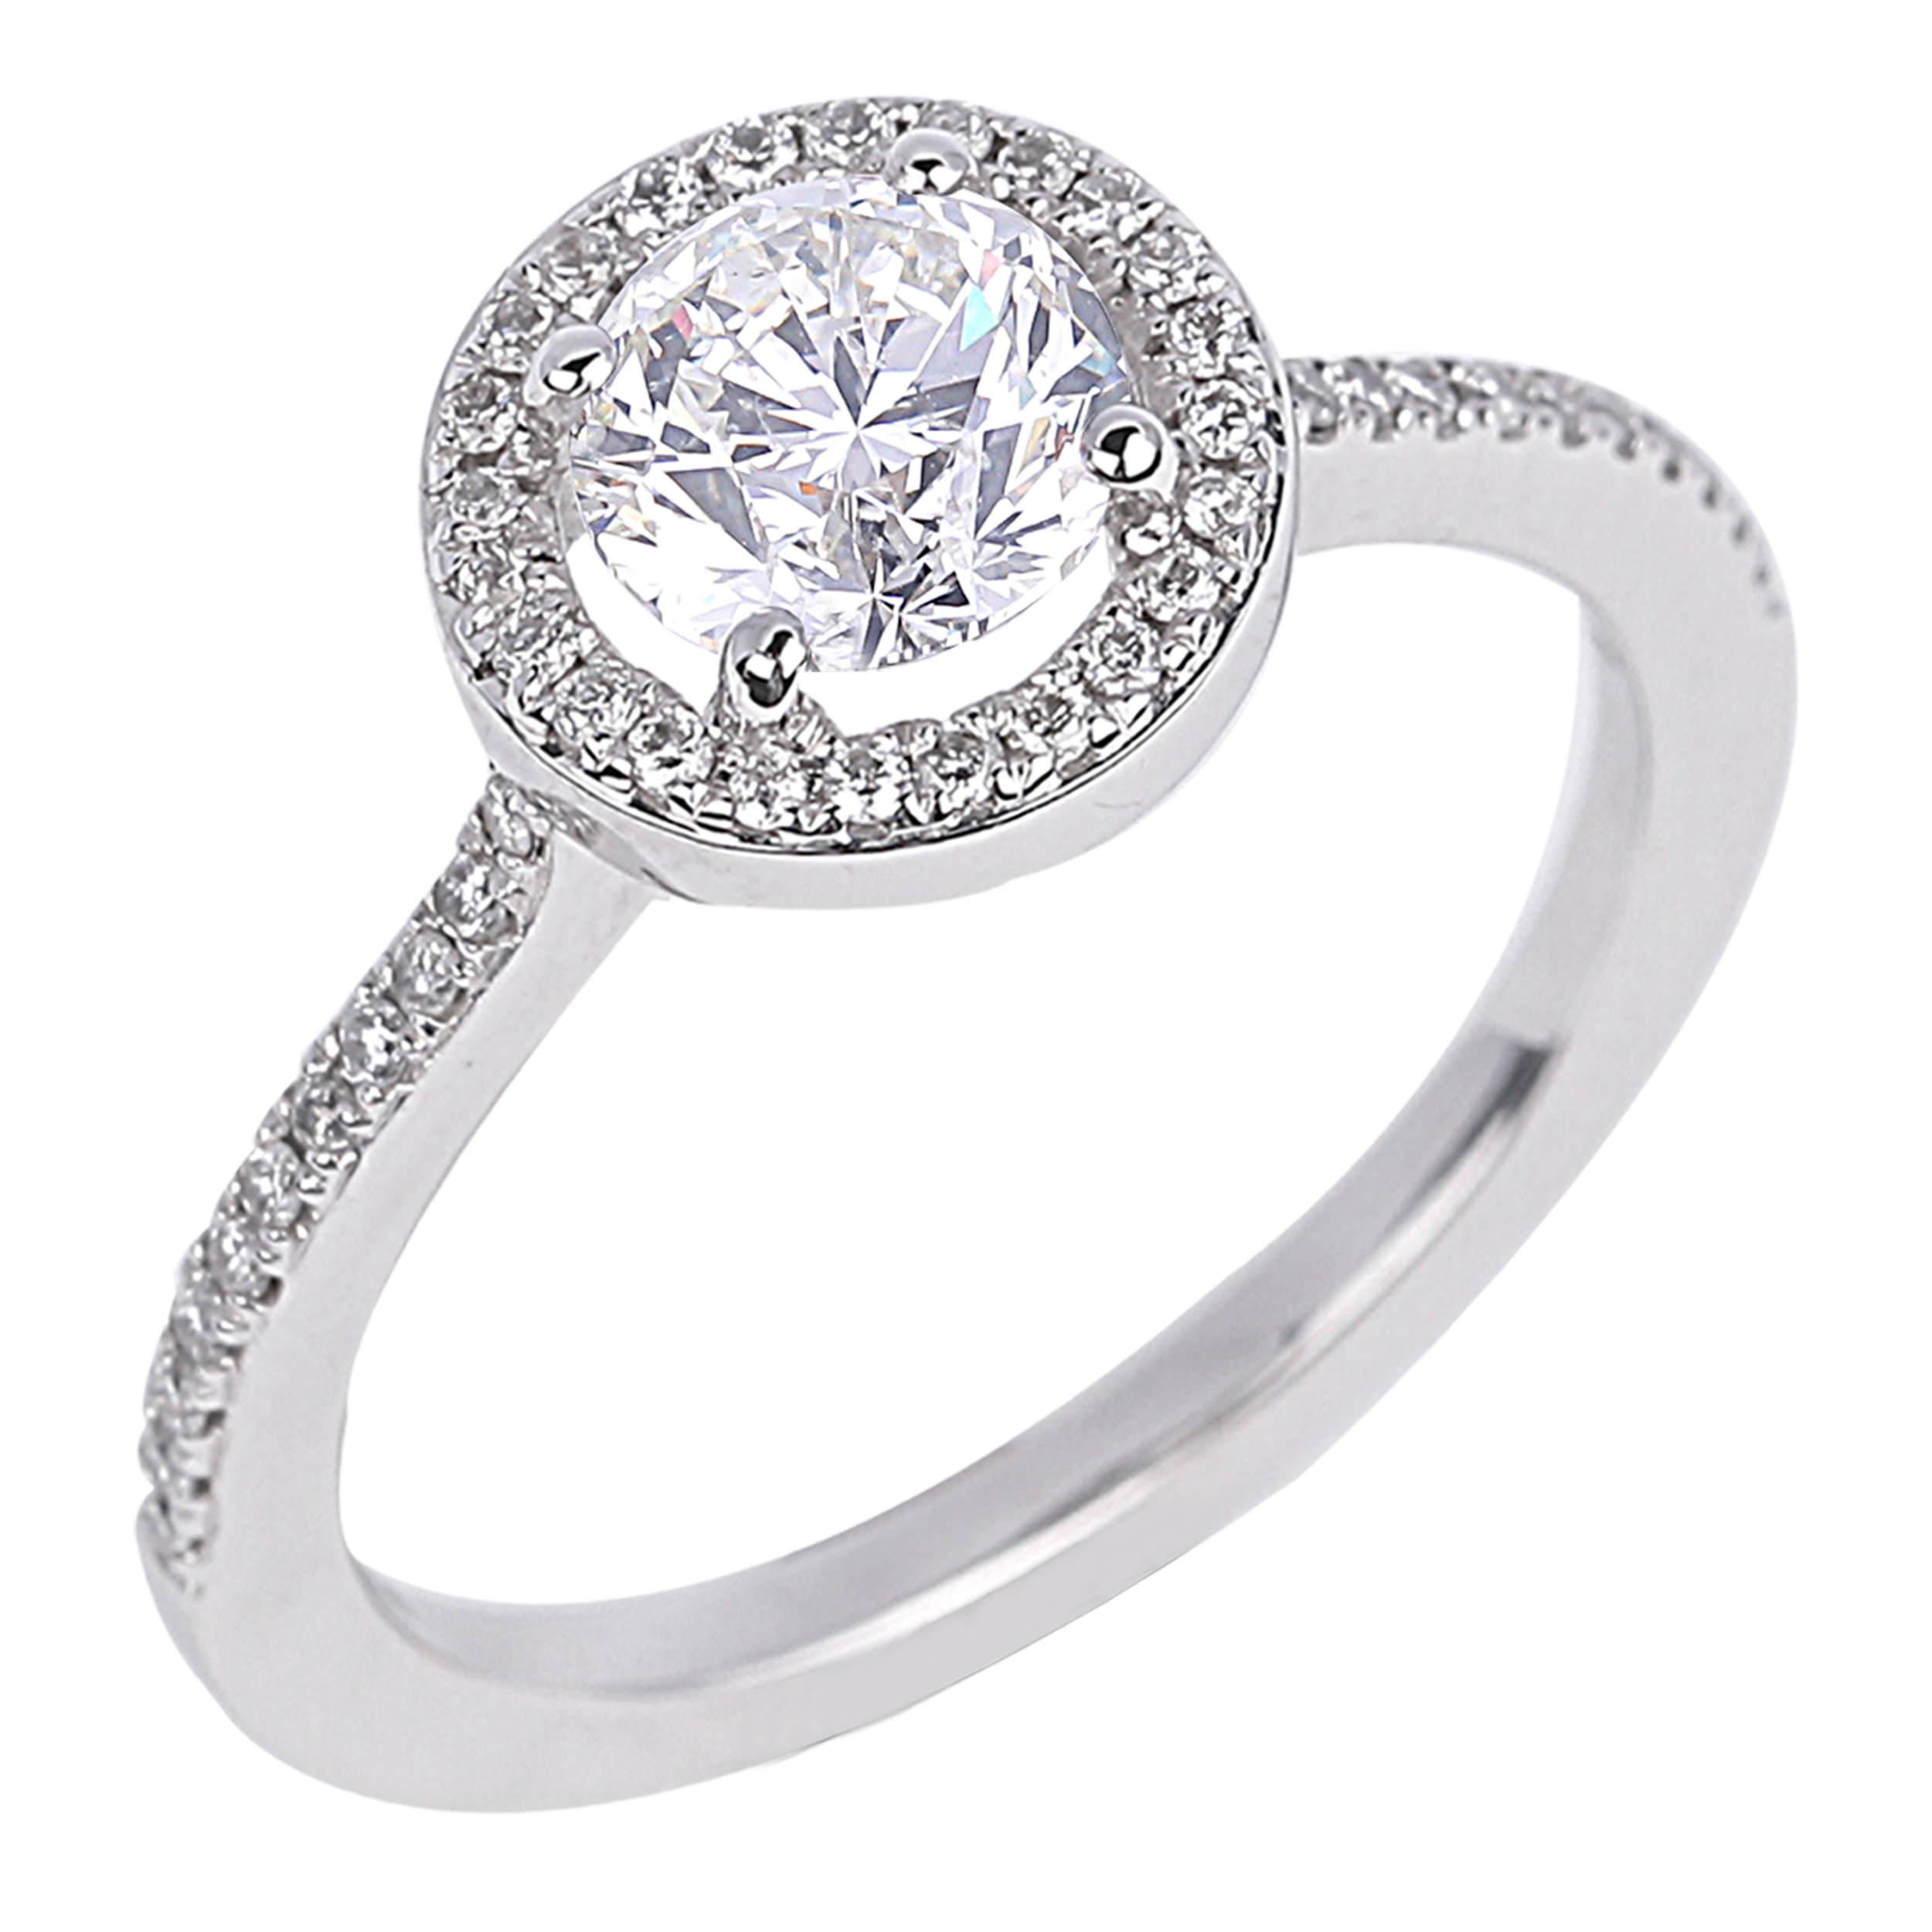 Diamond Engagement Halo Rings SGR723 (Rings)